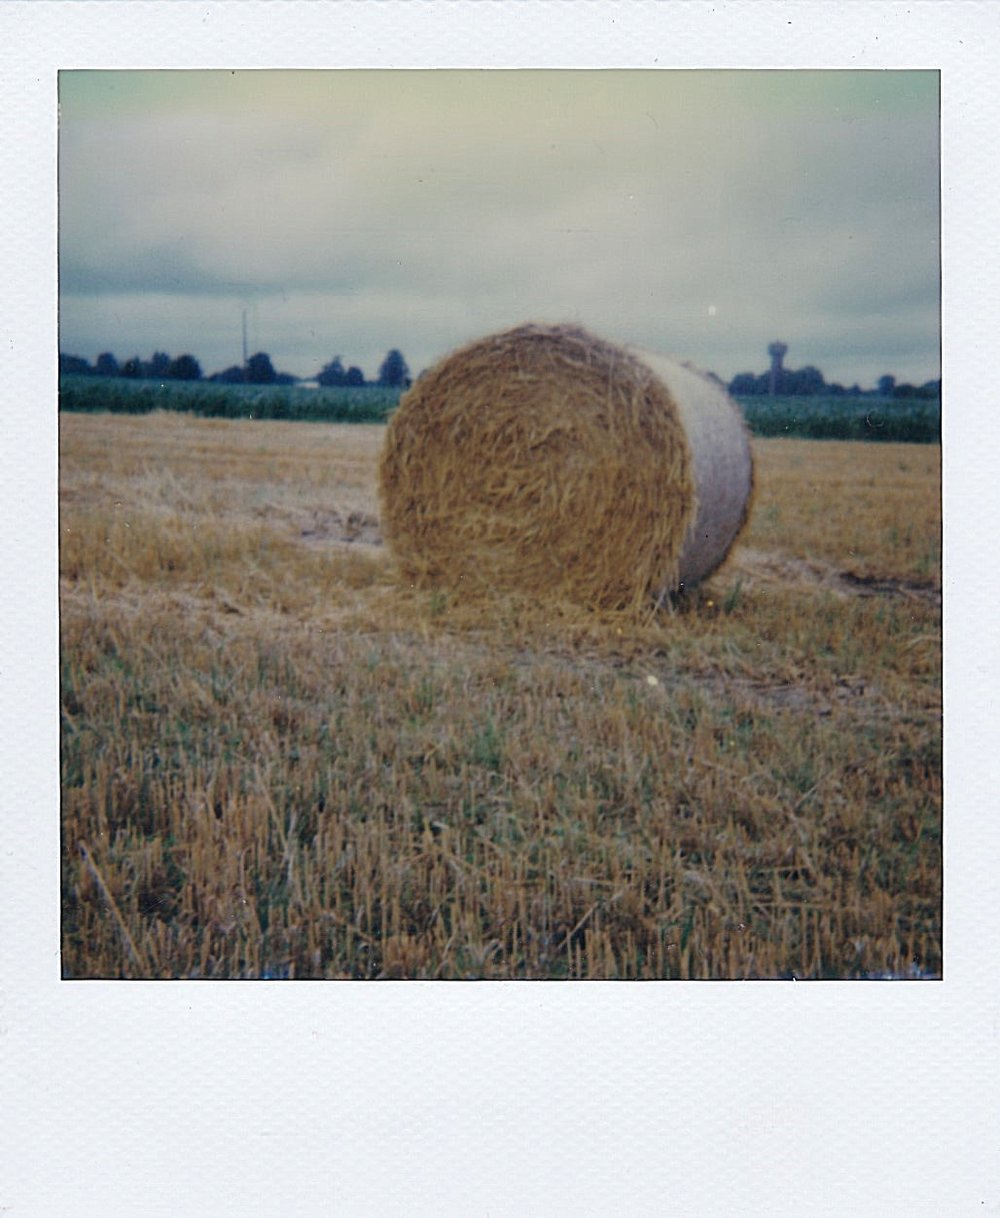 andreea-andrei-polaroid-semi-zine-feature-photography-image-9.jpg